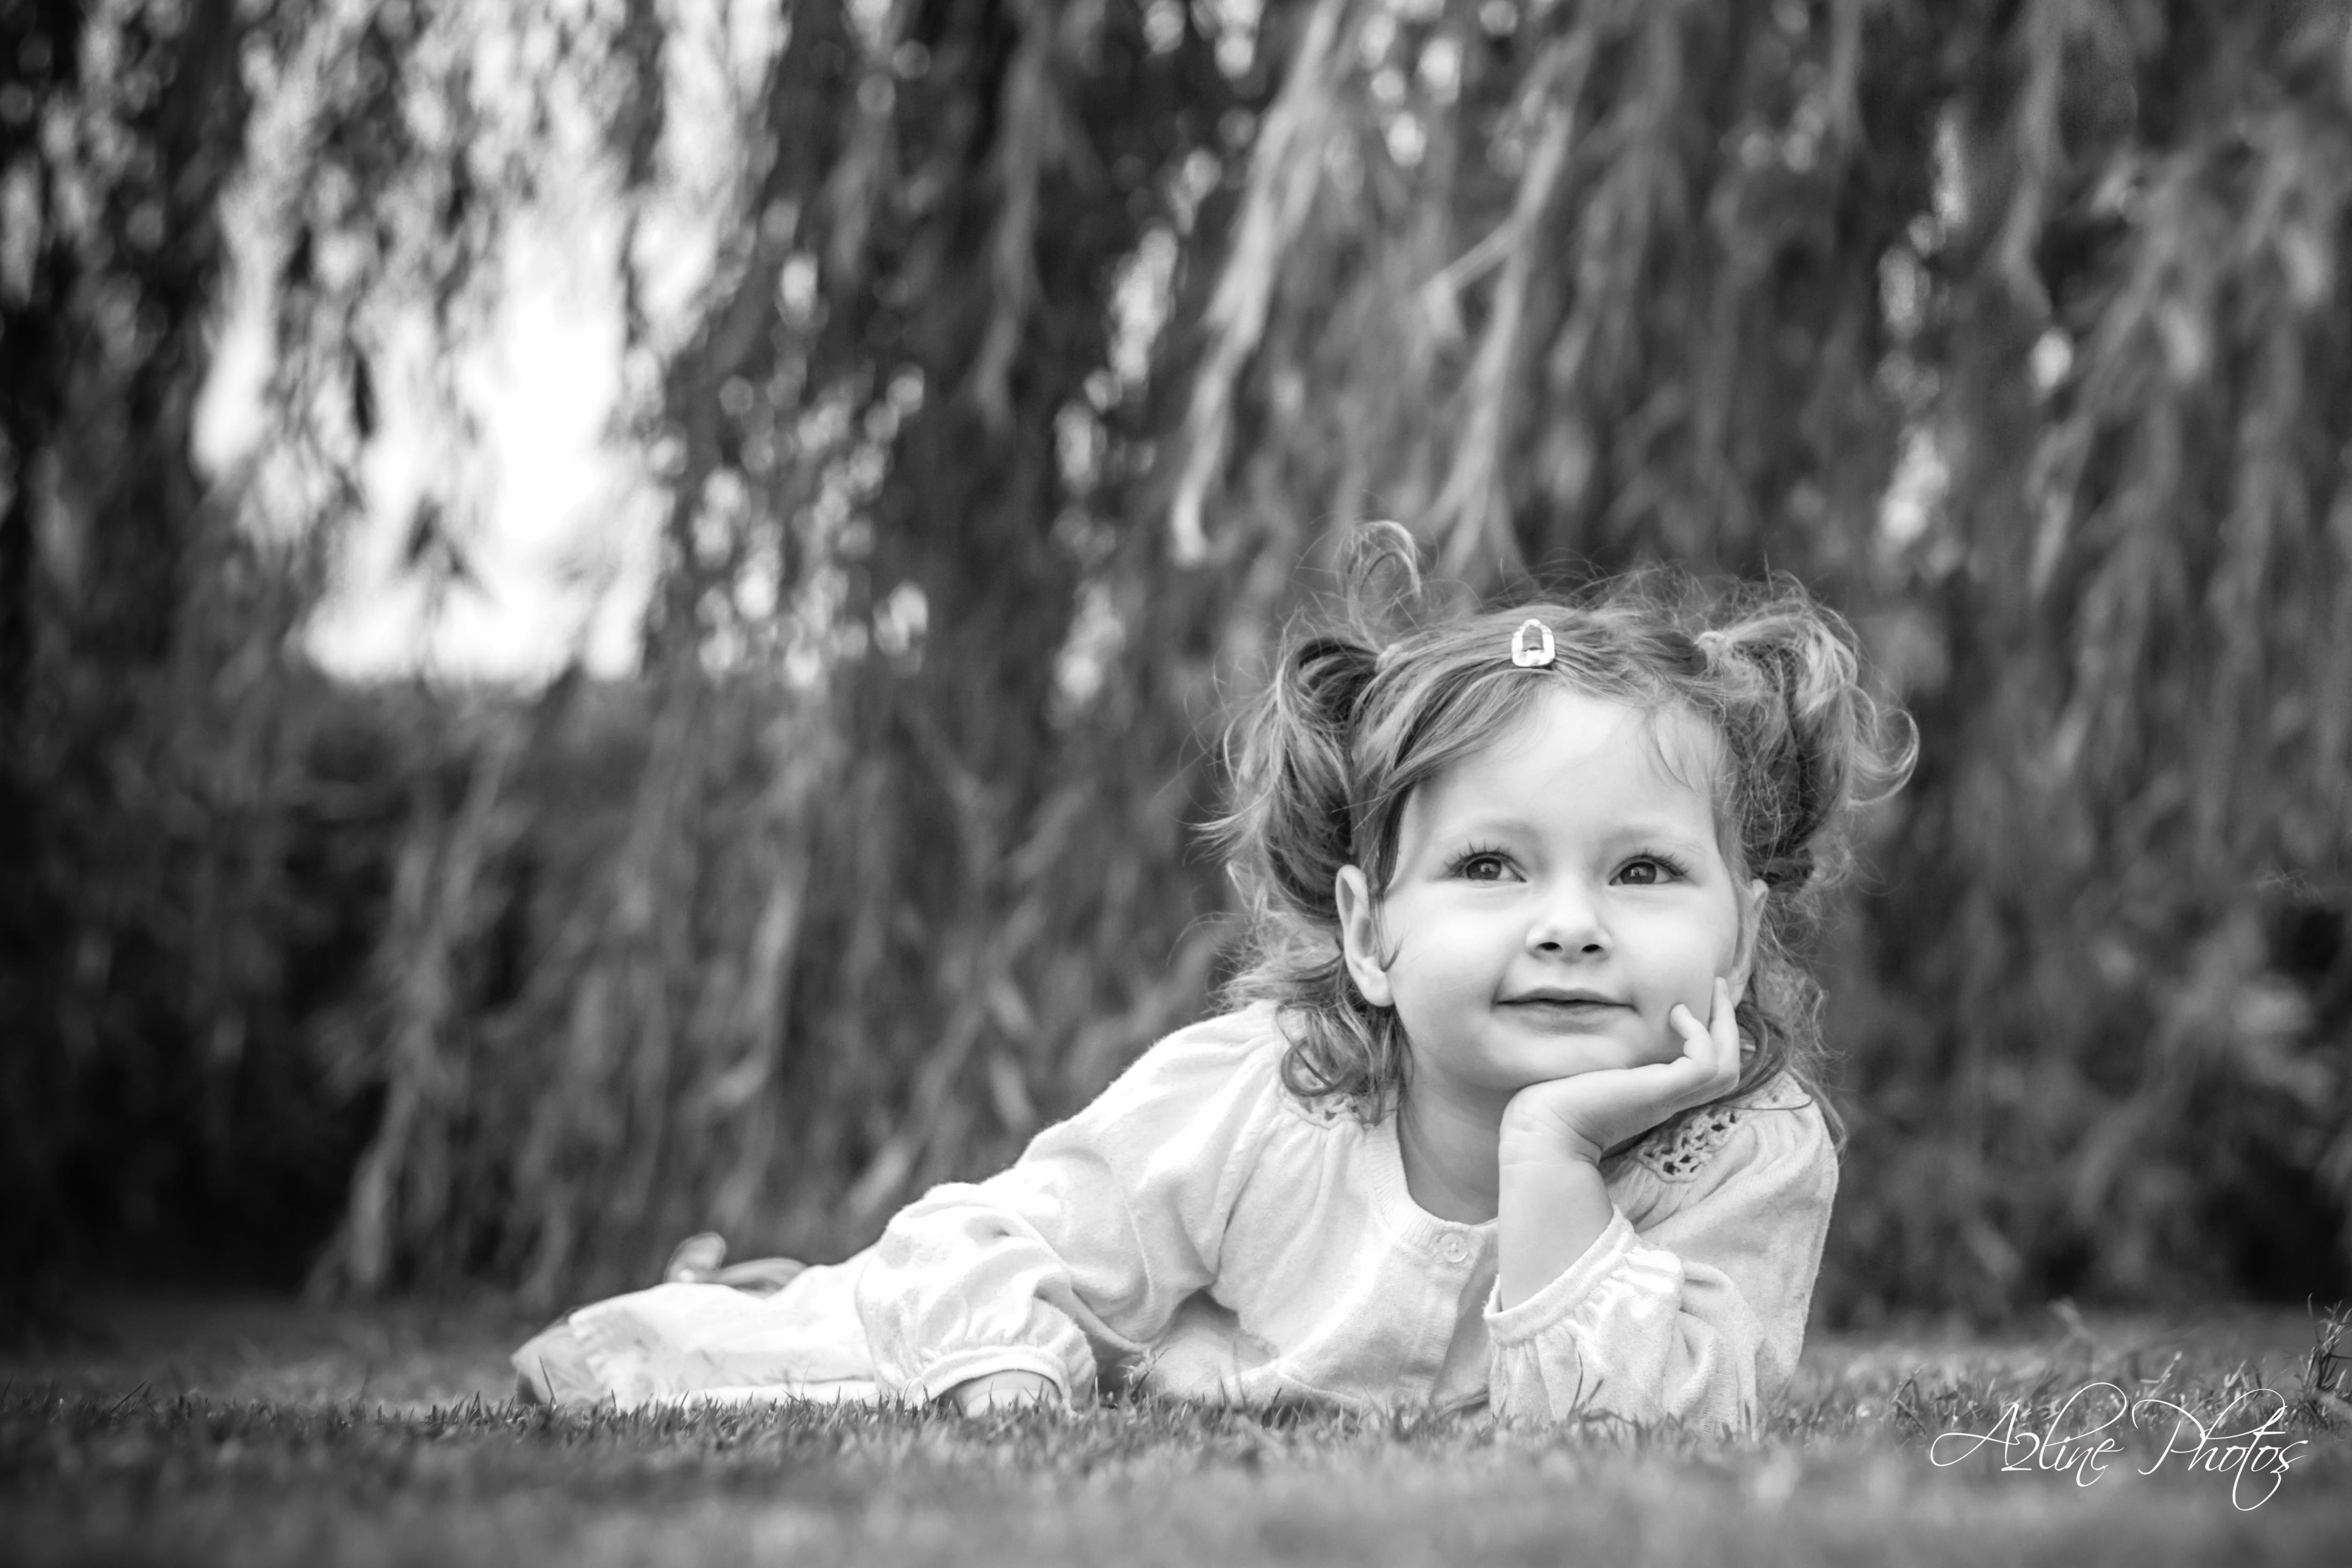 photographe portrait enfants Adeline